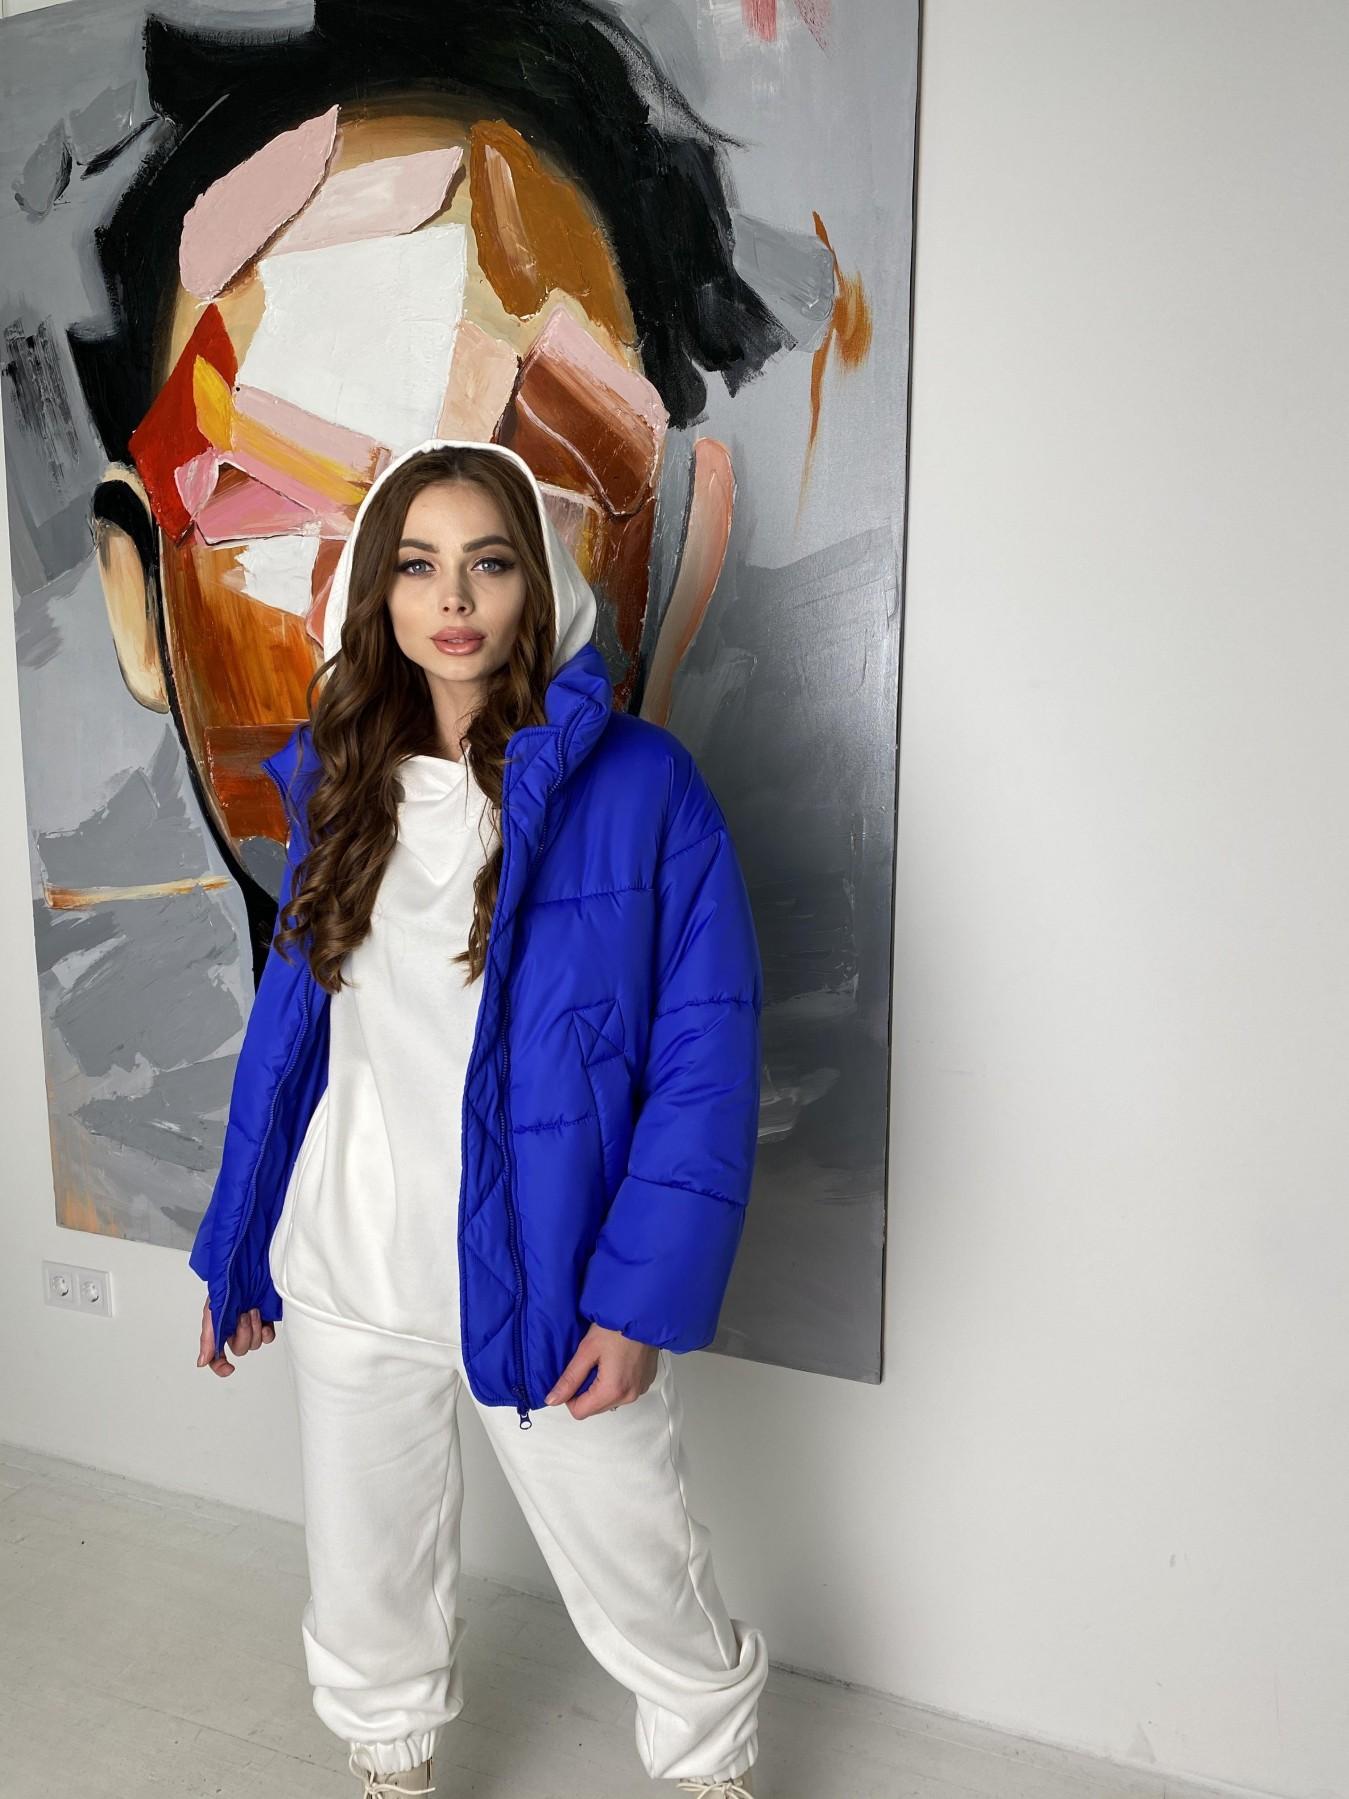 Муд куртка из плащевой ткани 10509 АРТ. 46852 Цвет: Электрик - фото 9, интернет магазин tm-modus.ru